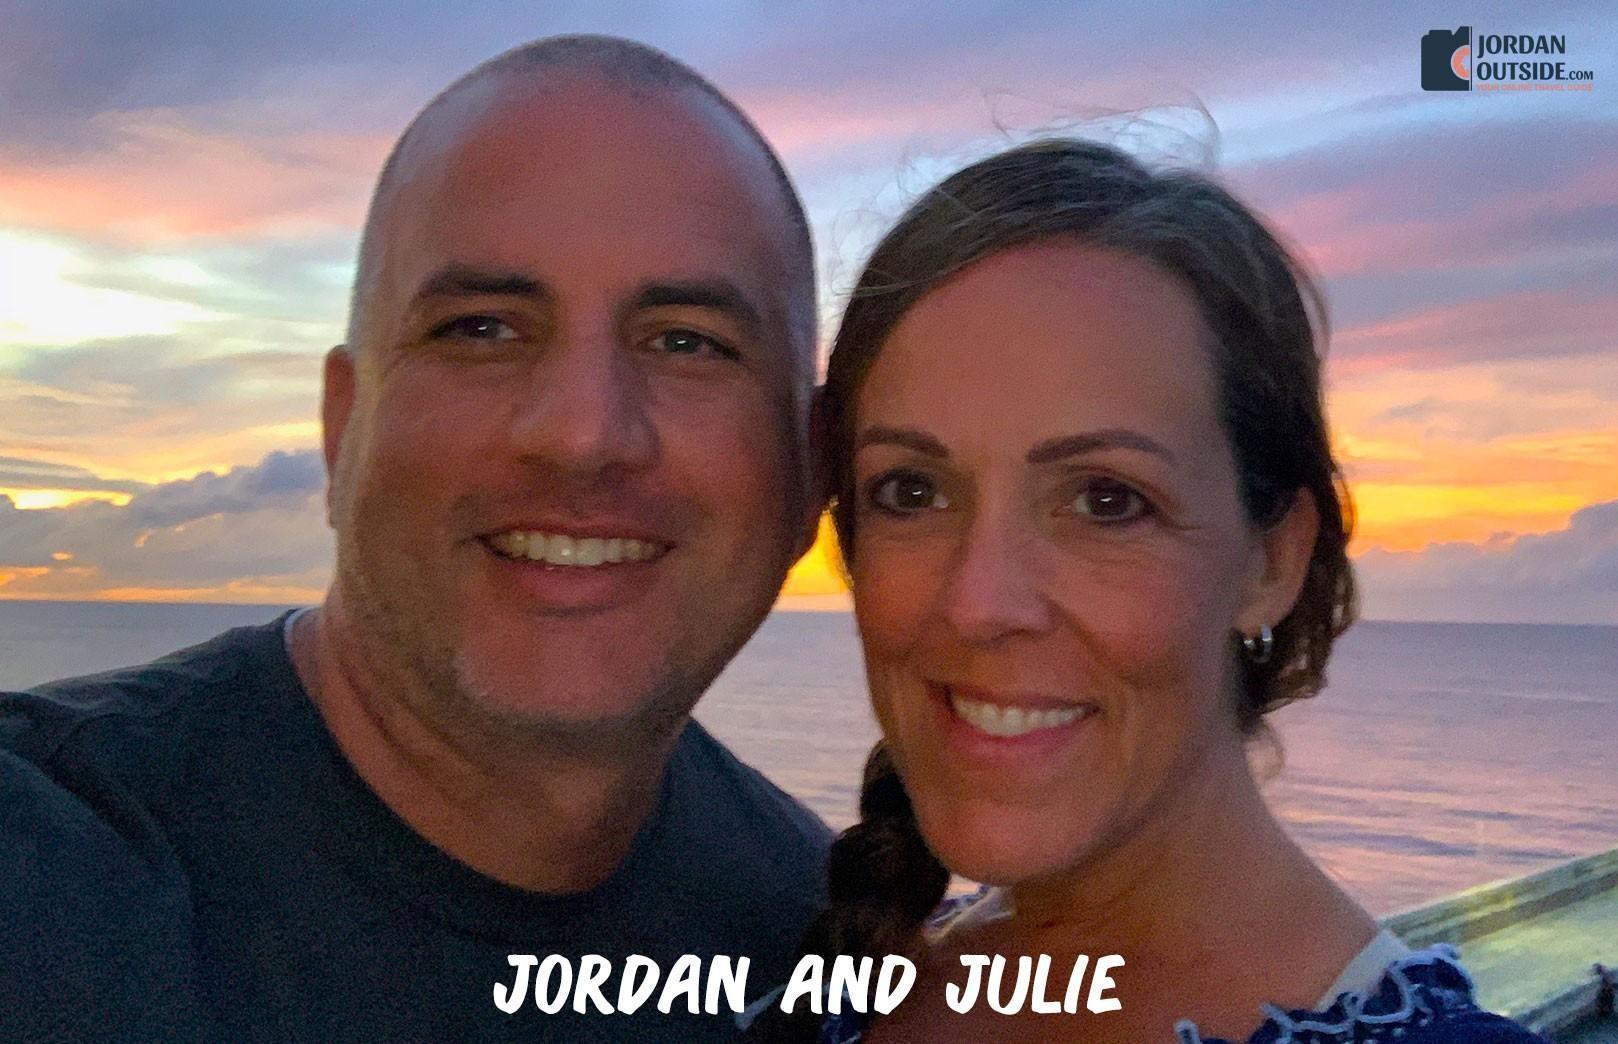 Jordan and Julie - JordanOutside.com